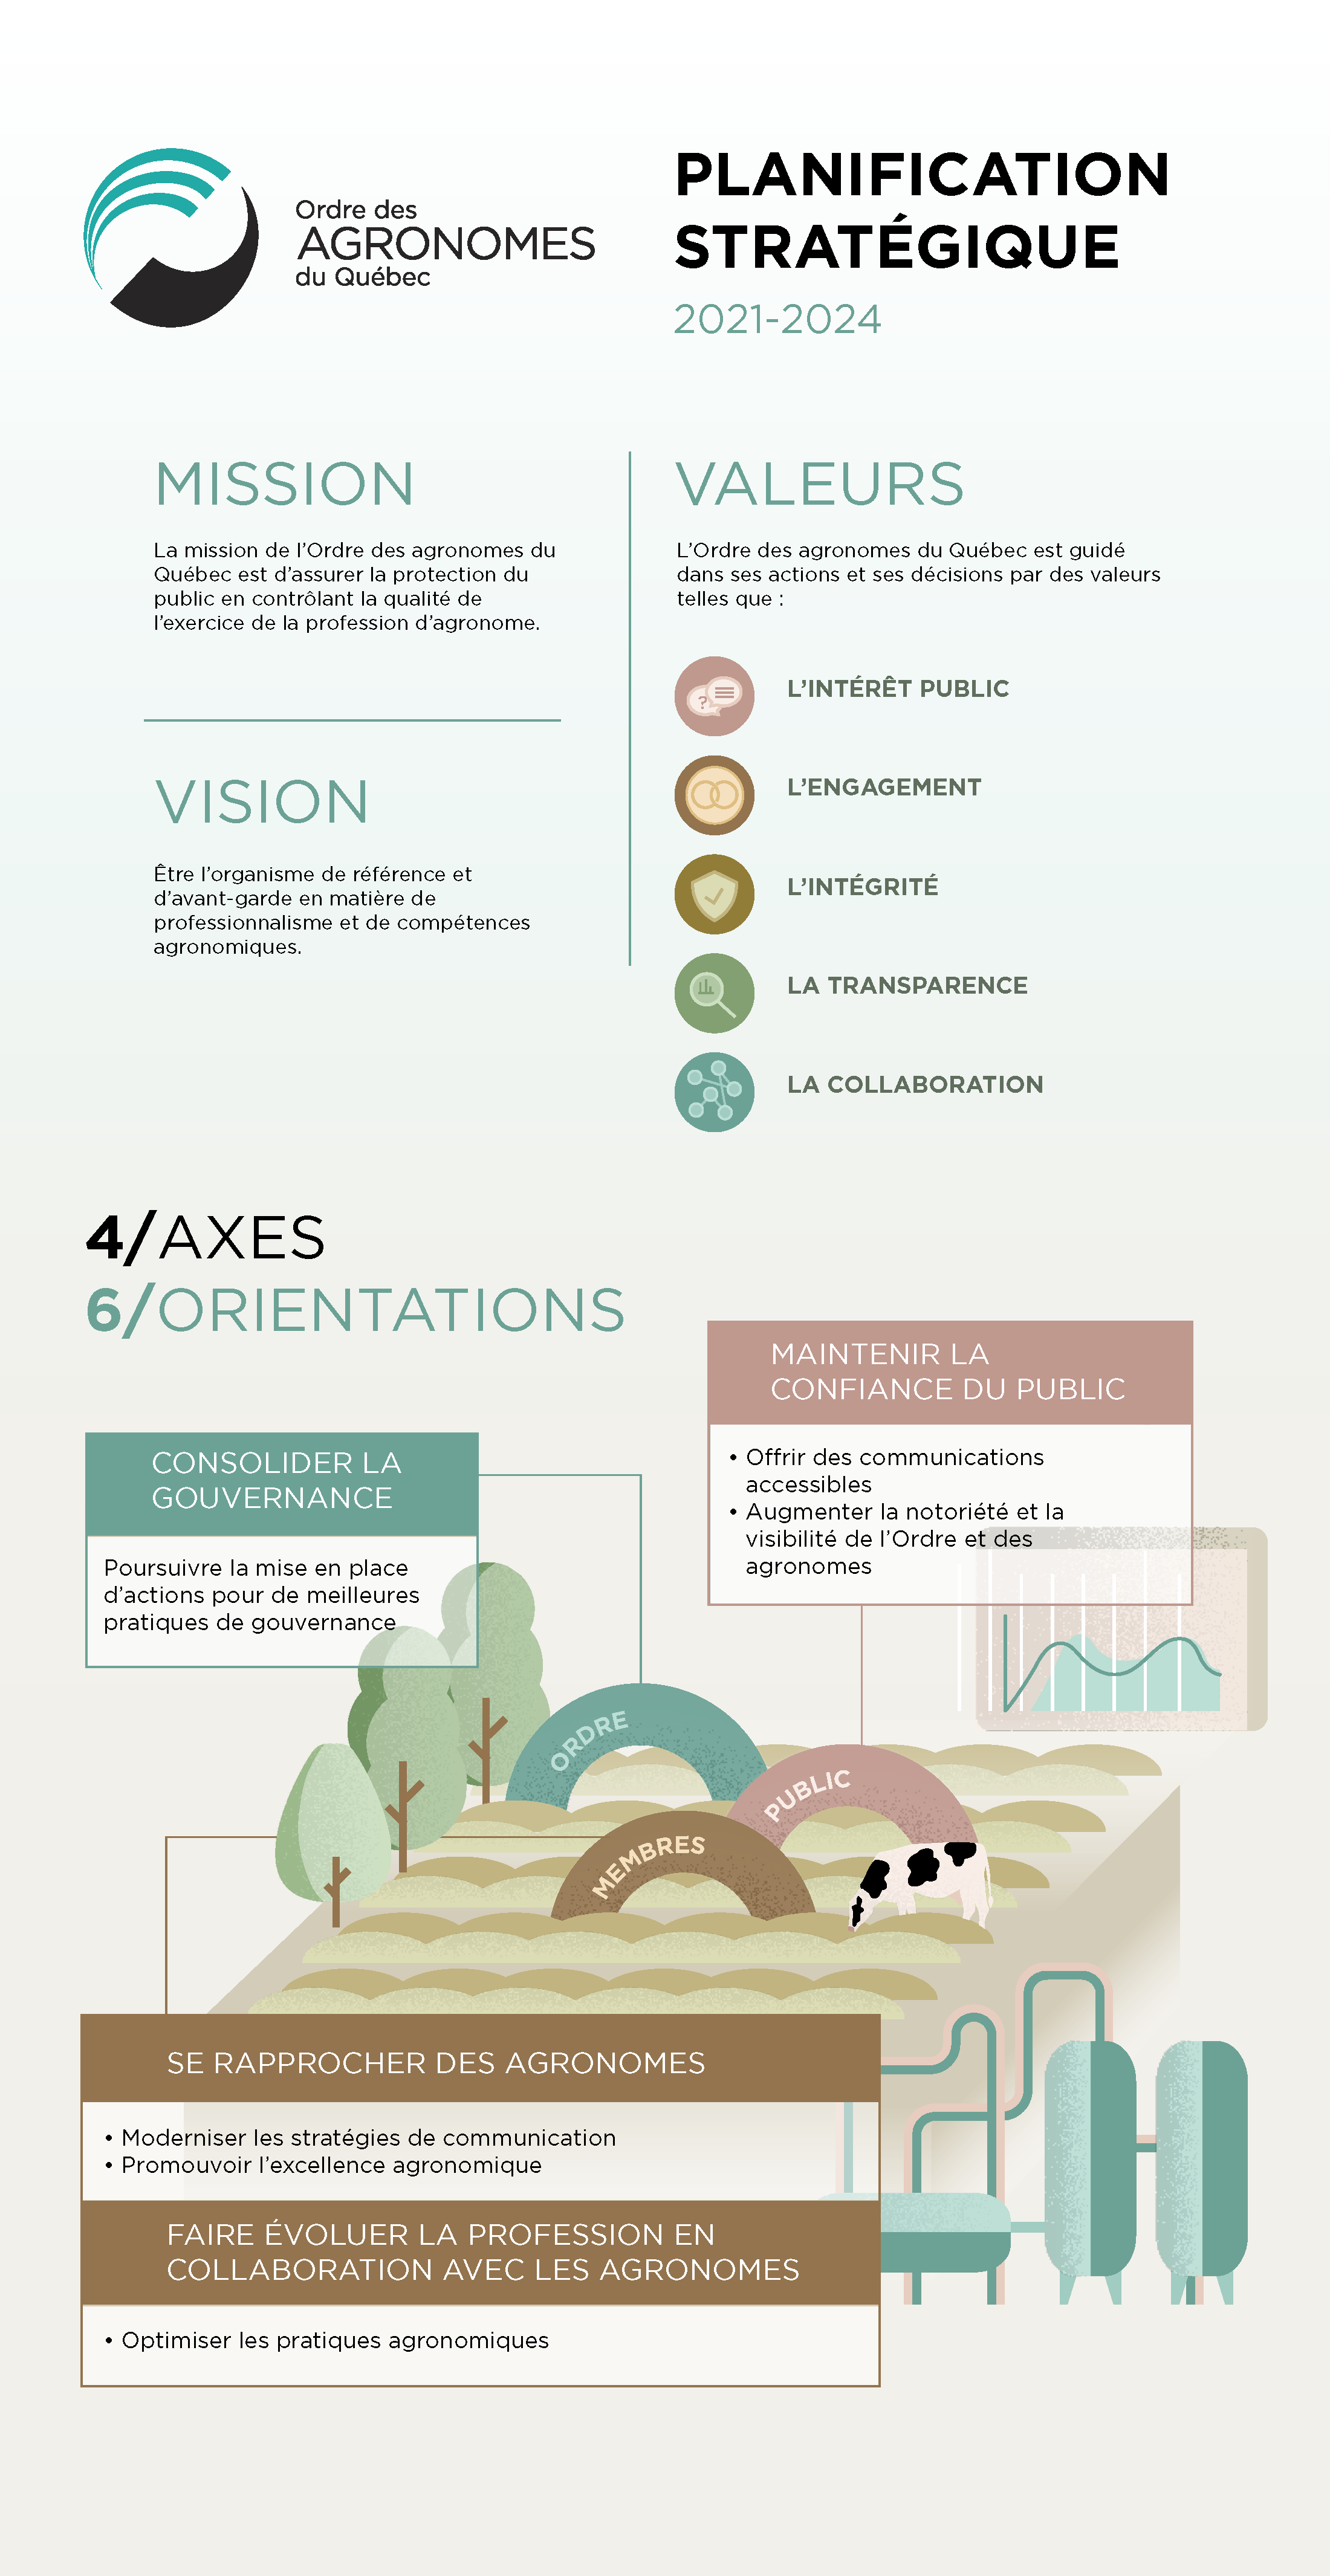 Planification Strategique 2021 2024 Ordre Des Agronomes Du Quebec